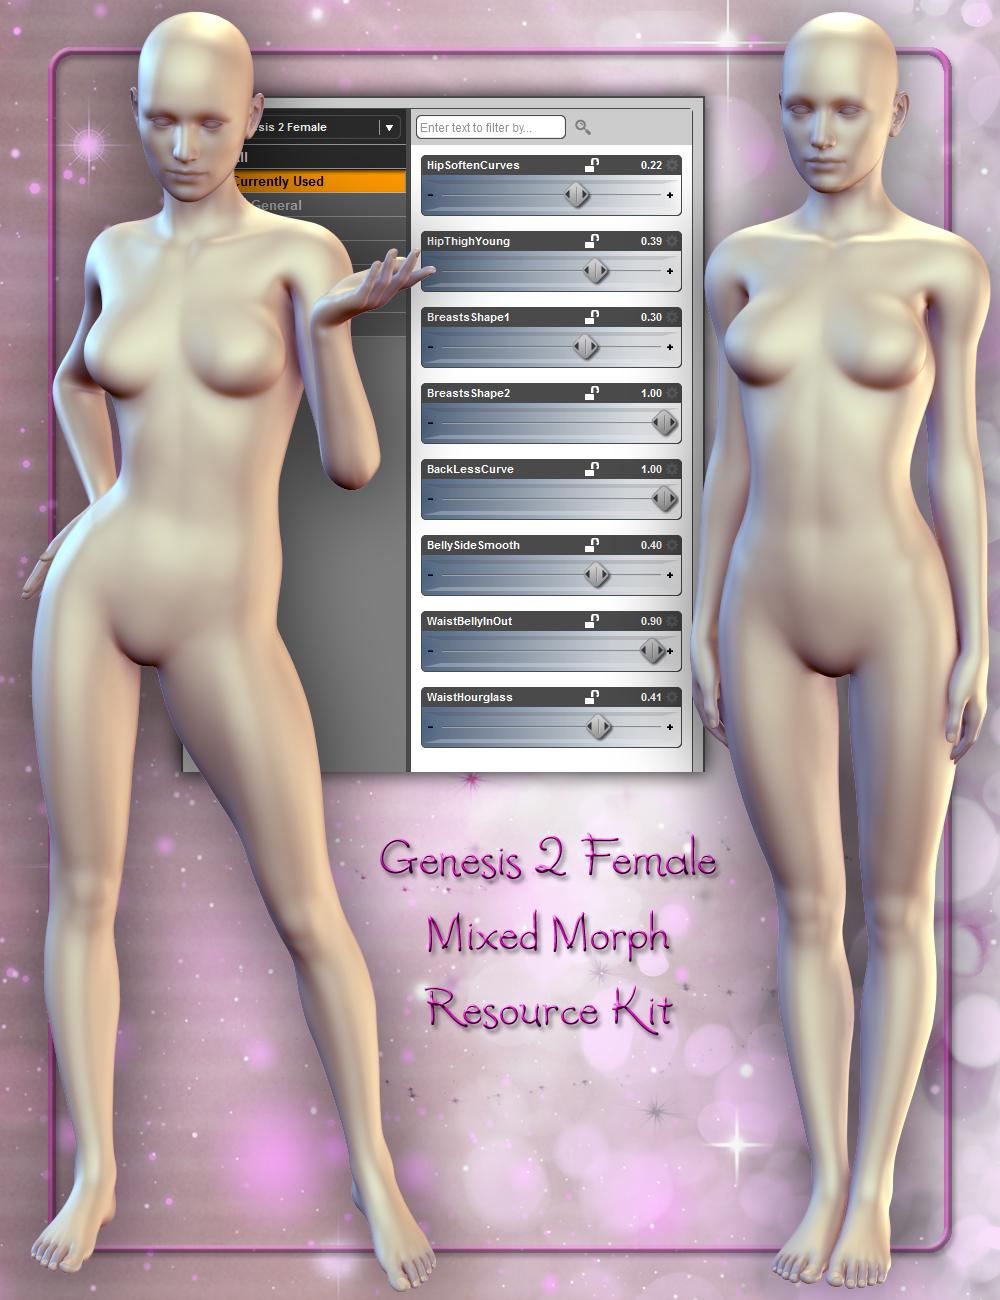 Genesis 2 Female Mixed Morph Resource Kit by: ThorneHandspan Studios, 3D Models by Daz 3D